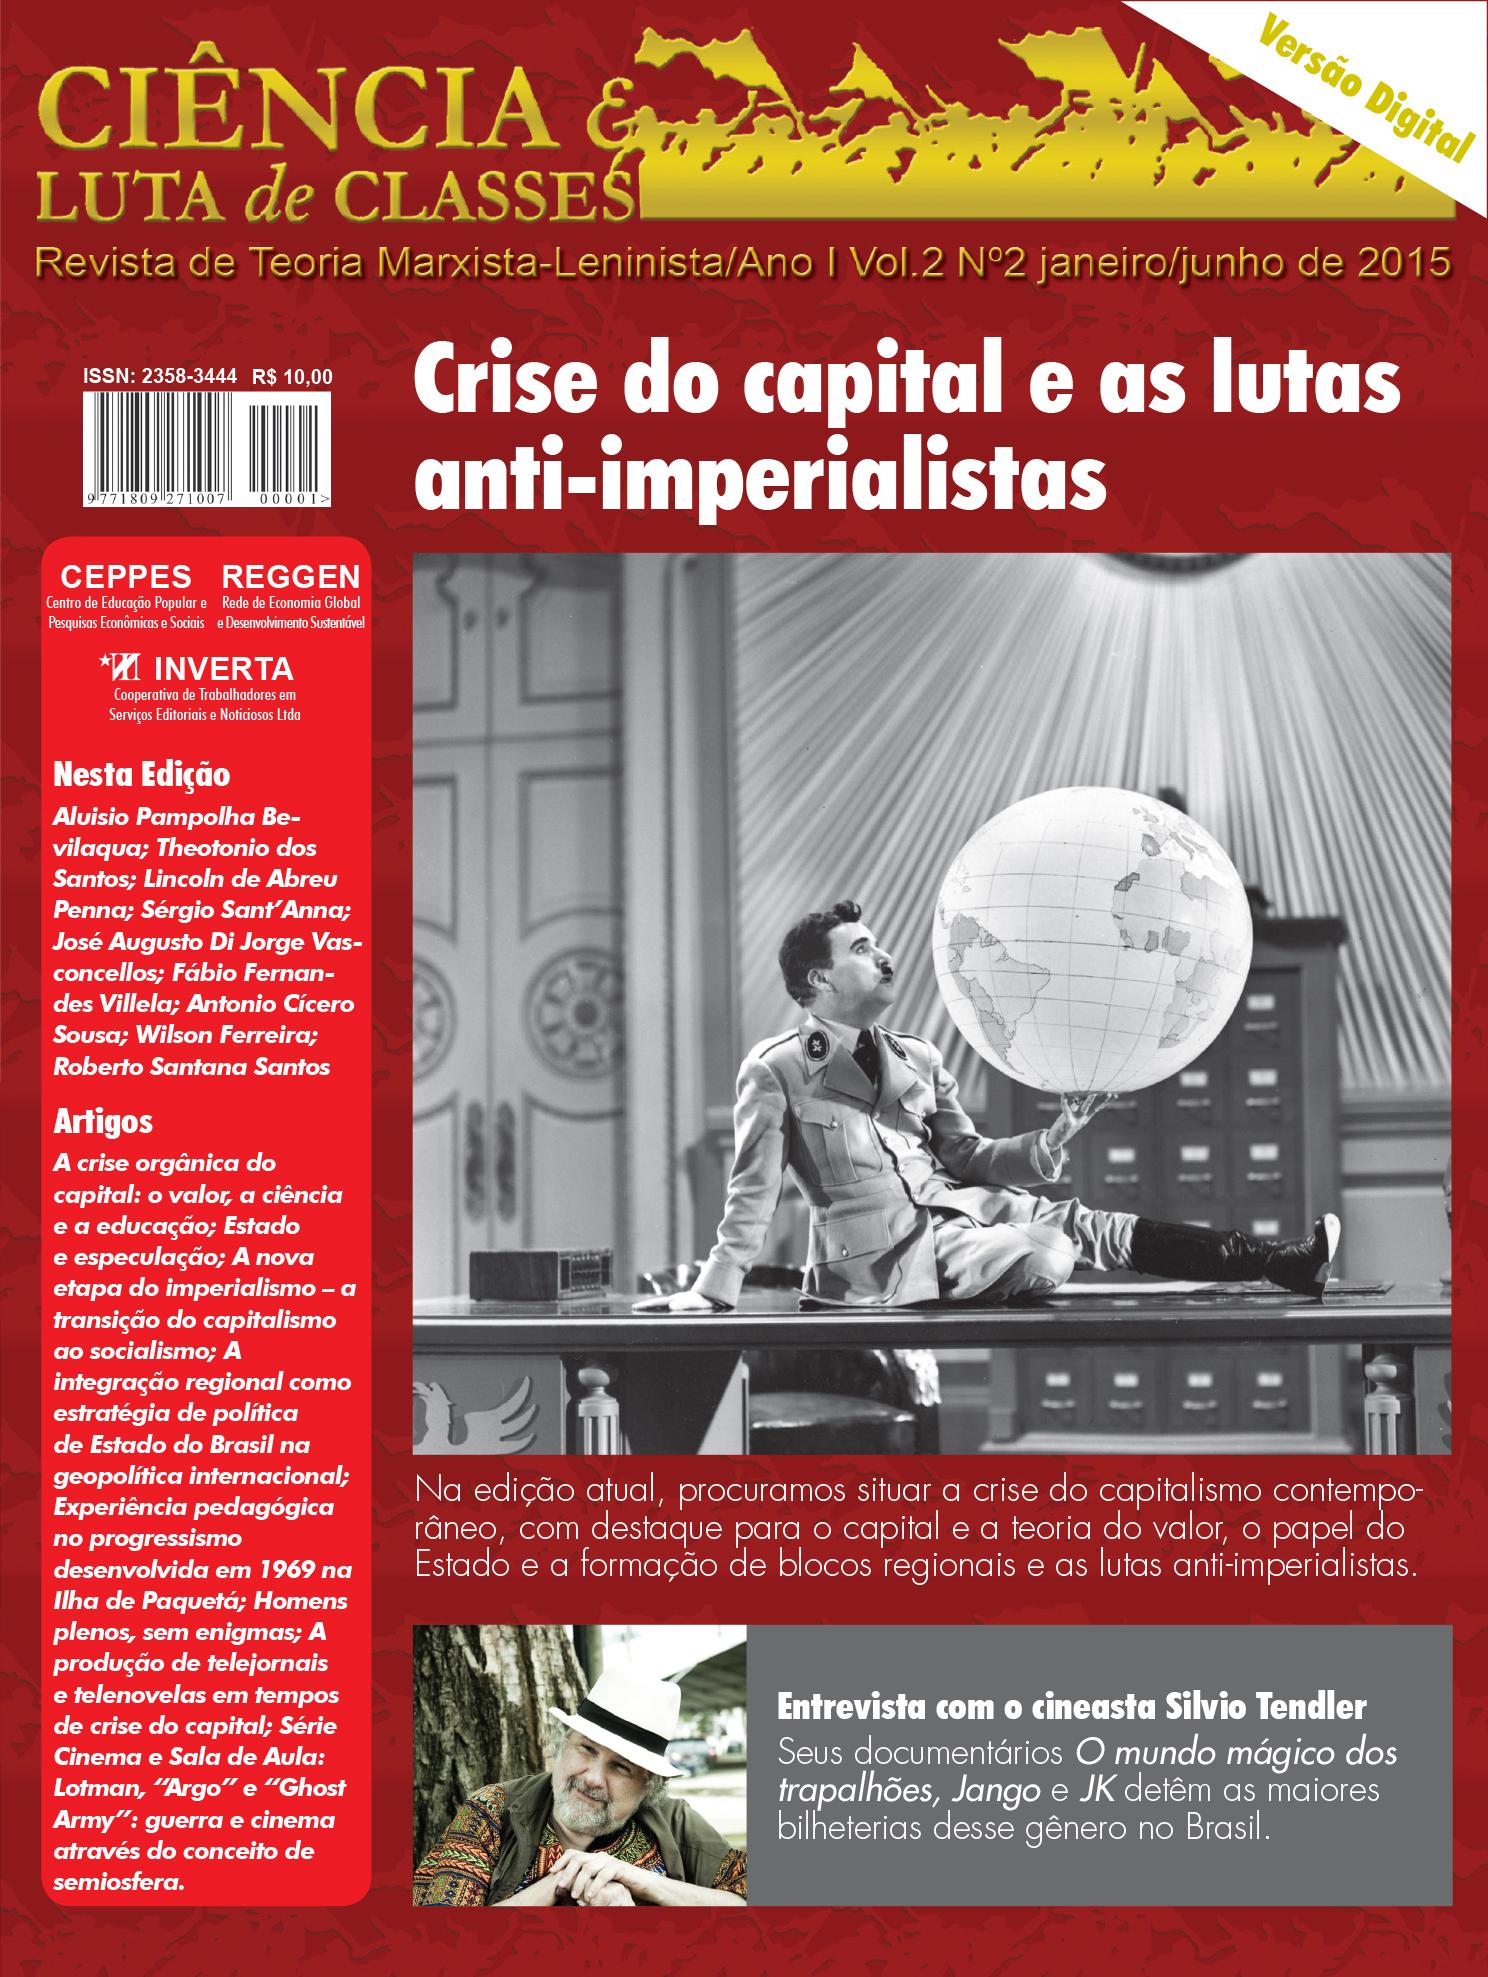 Visualizar v. 2 n. 2 (2015): Crise do Capital e as lutas anti-imperialistas, jan./jun. 2015